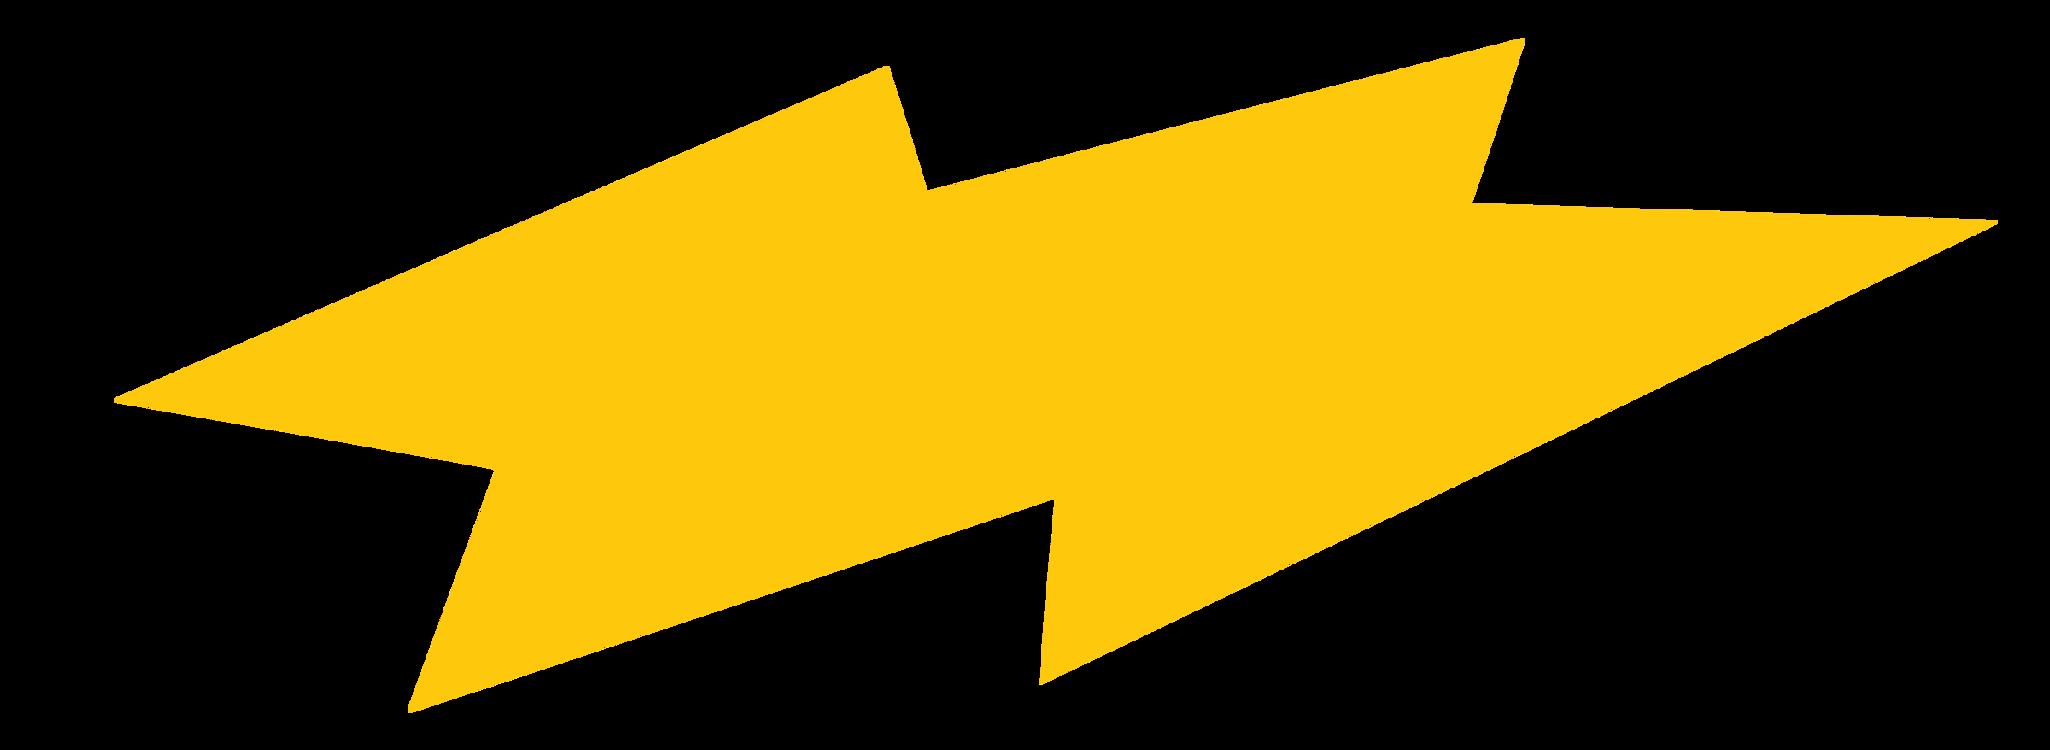 Angle,Yellow,Leaf